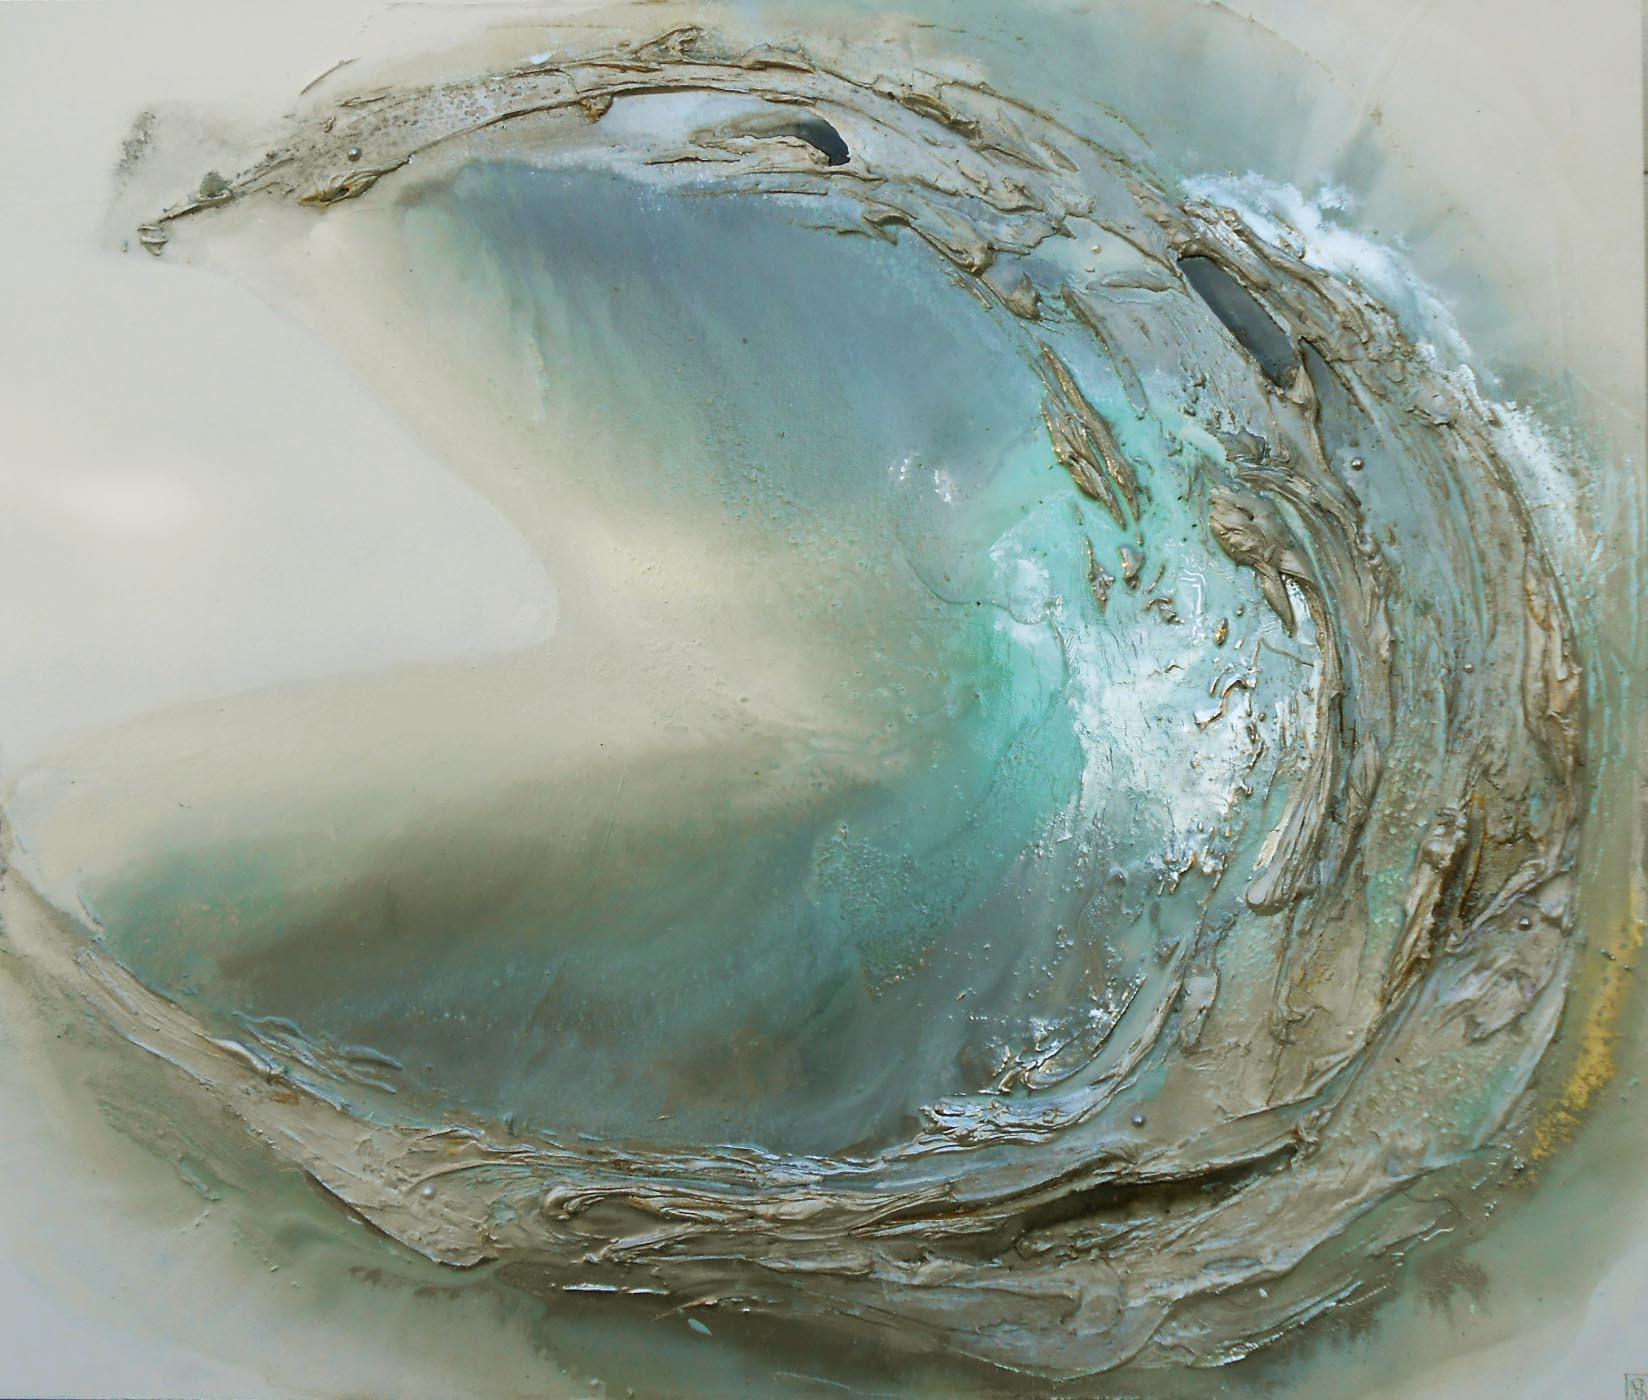 light blue oyster